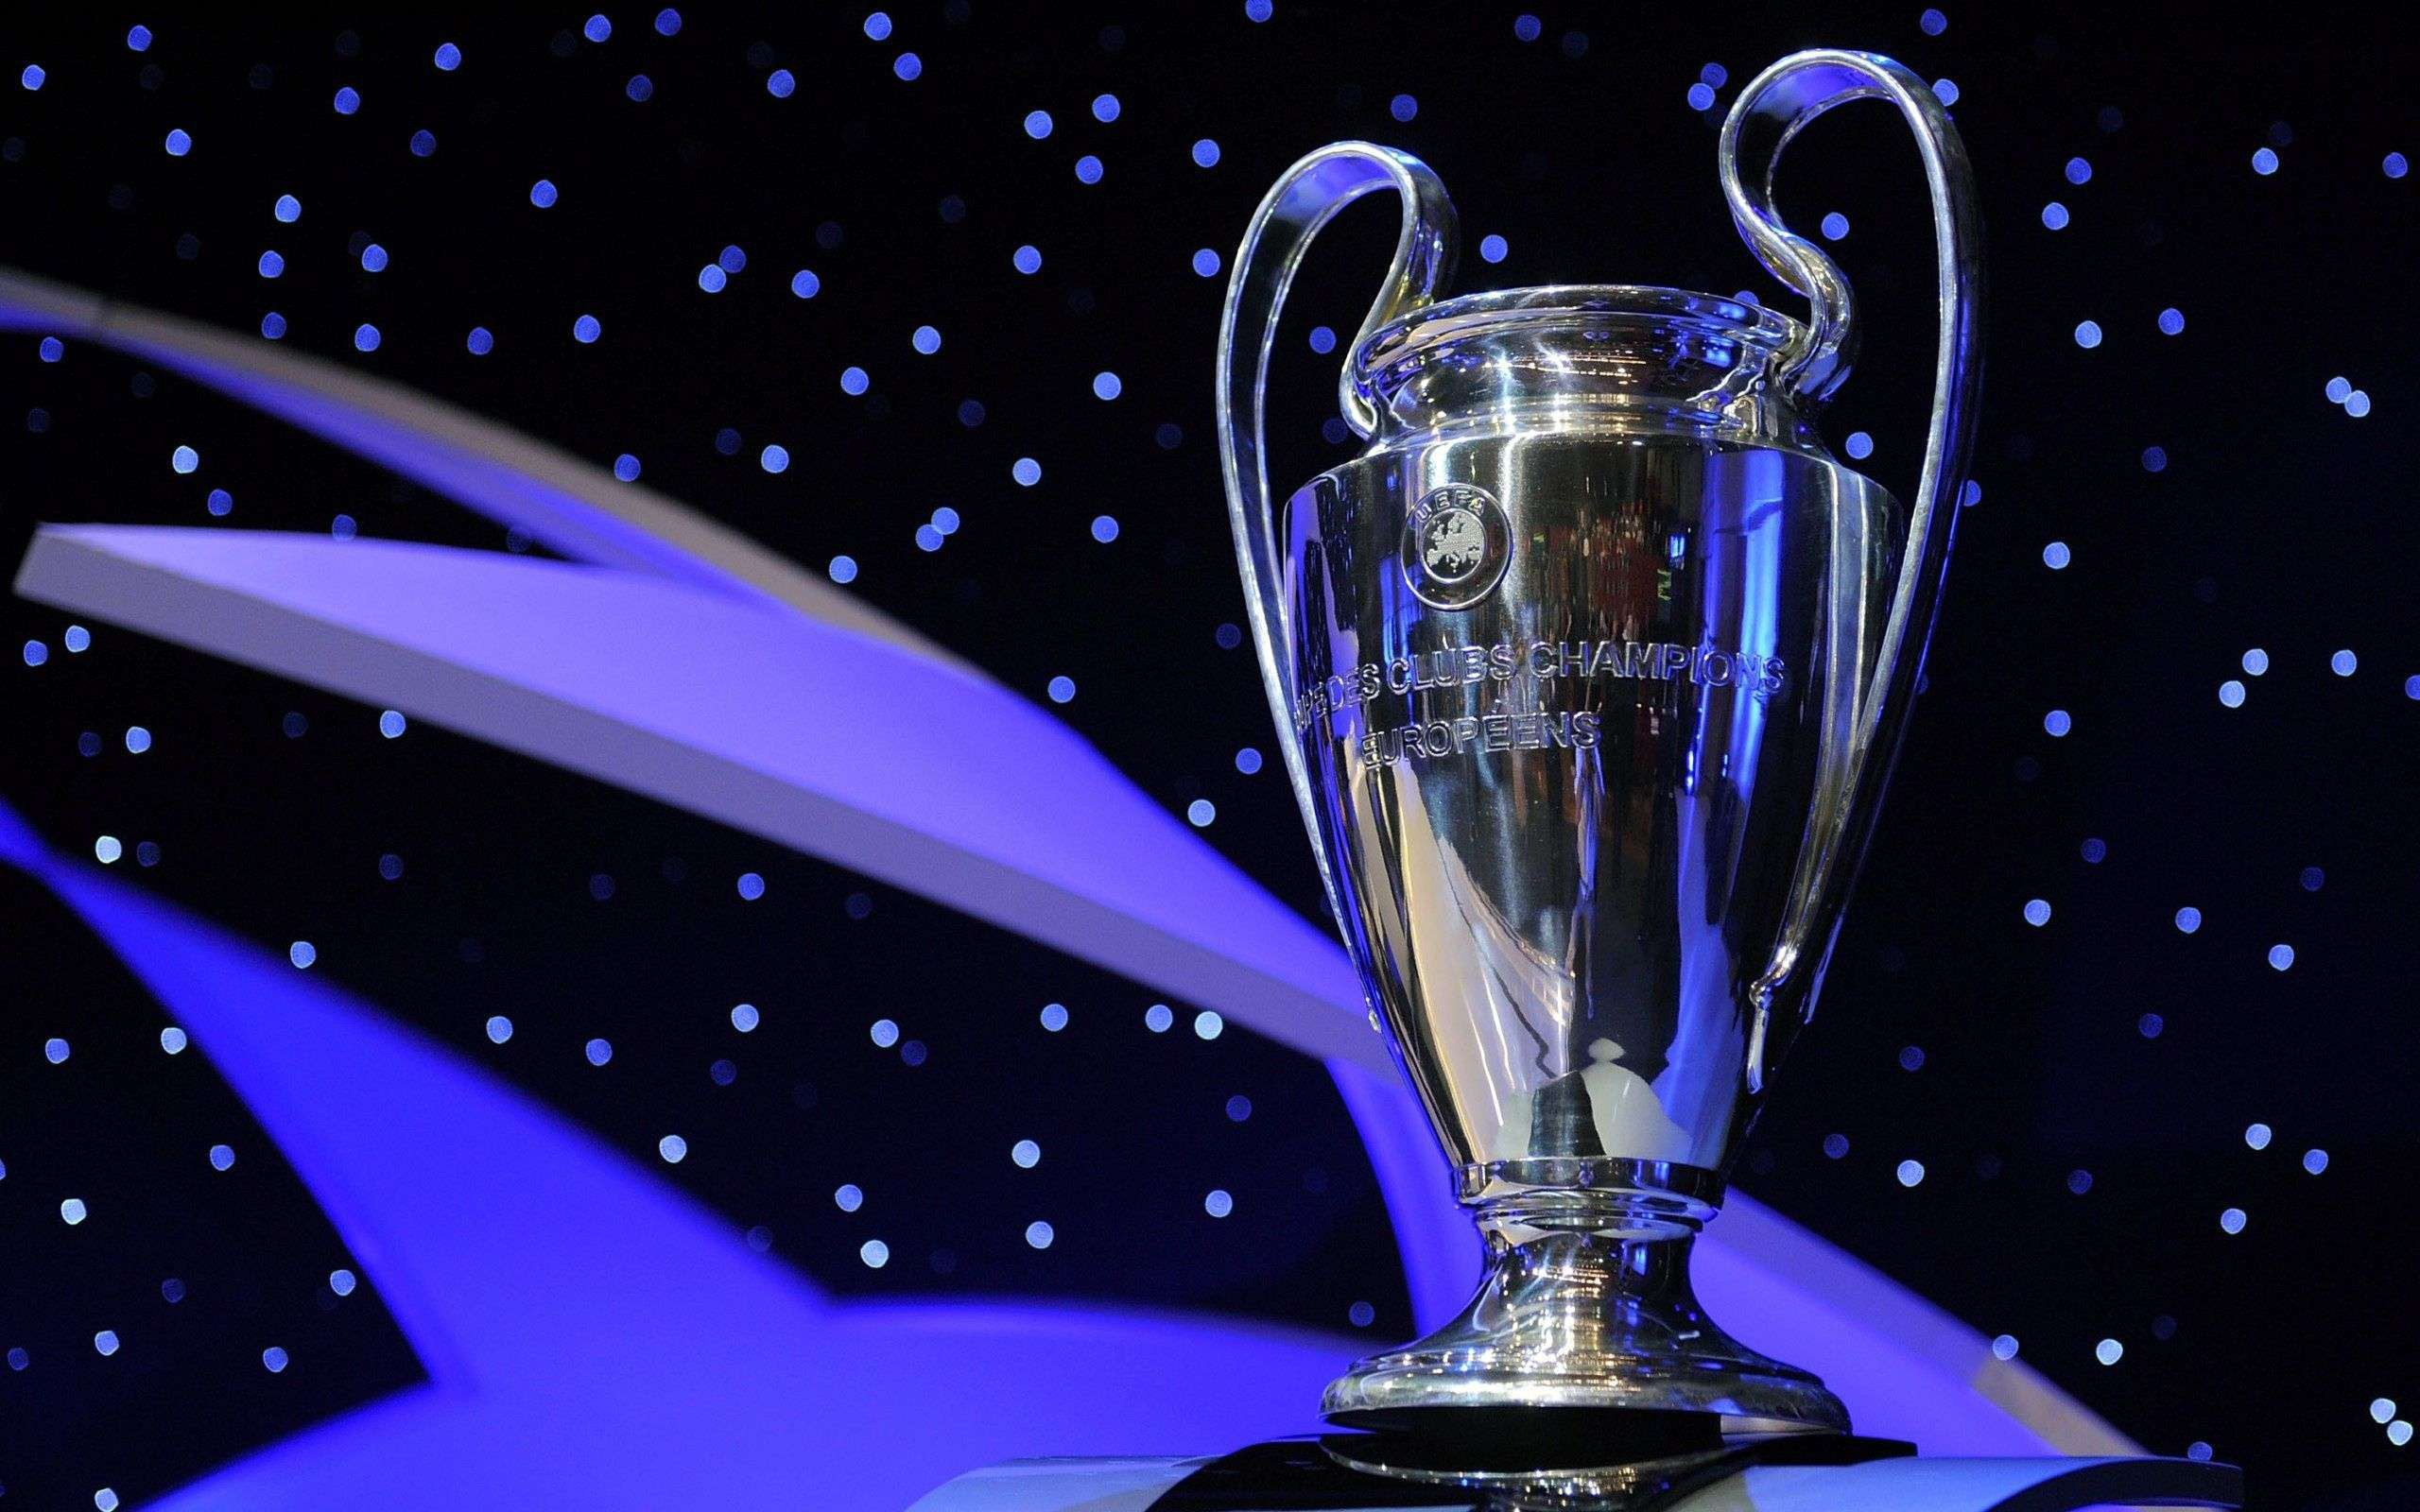 Uefa-Champions-League-Trophy-Hd-Desktop-Wallpaper-Download